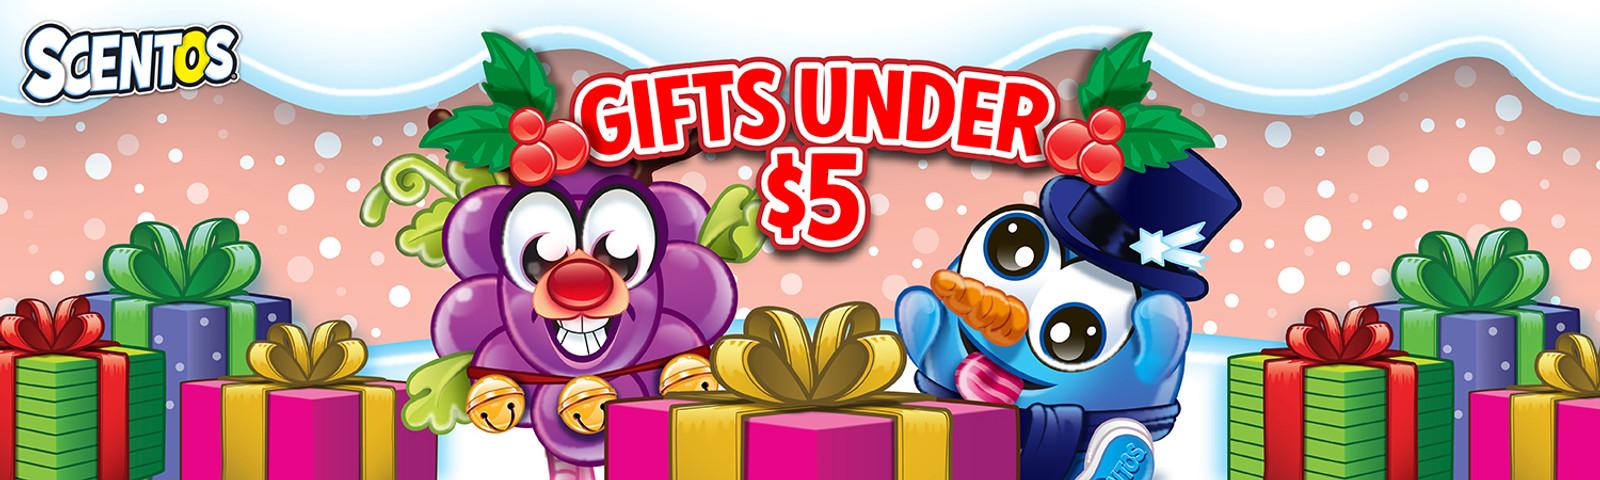 Gifts Under $5